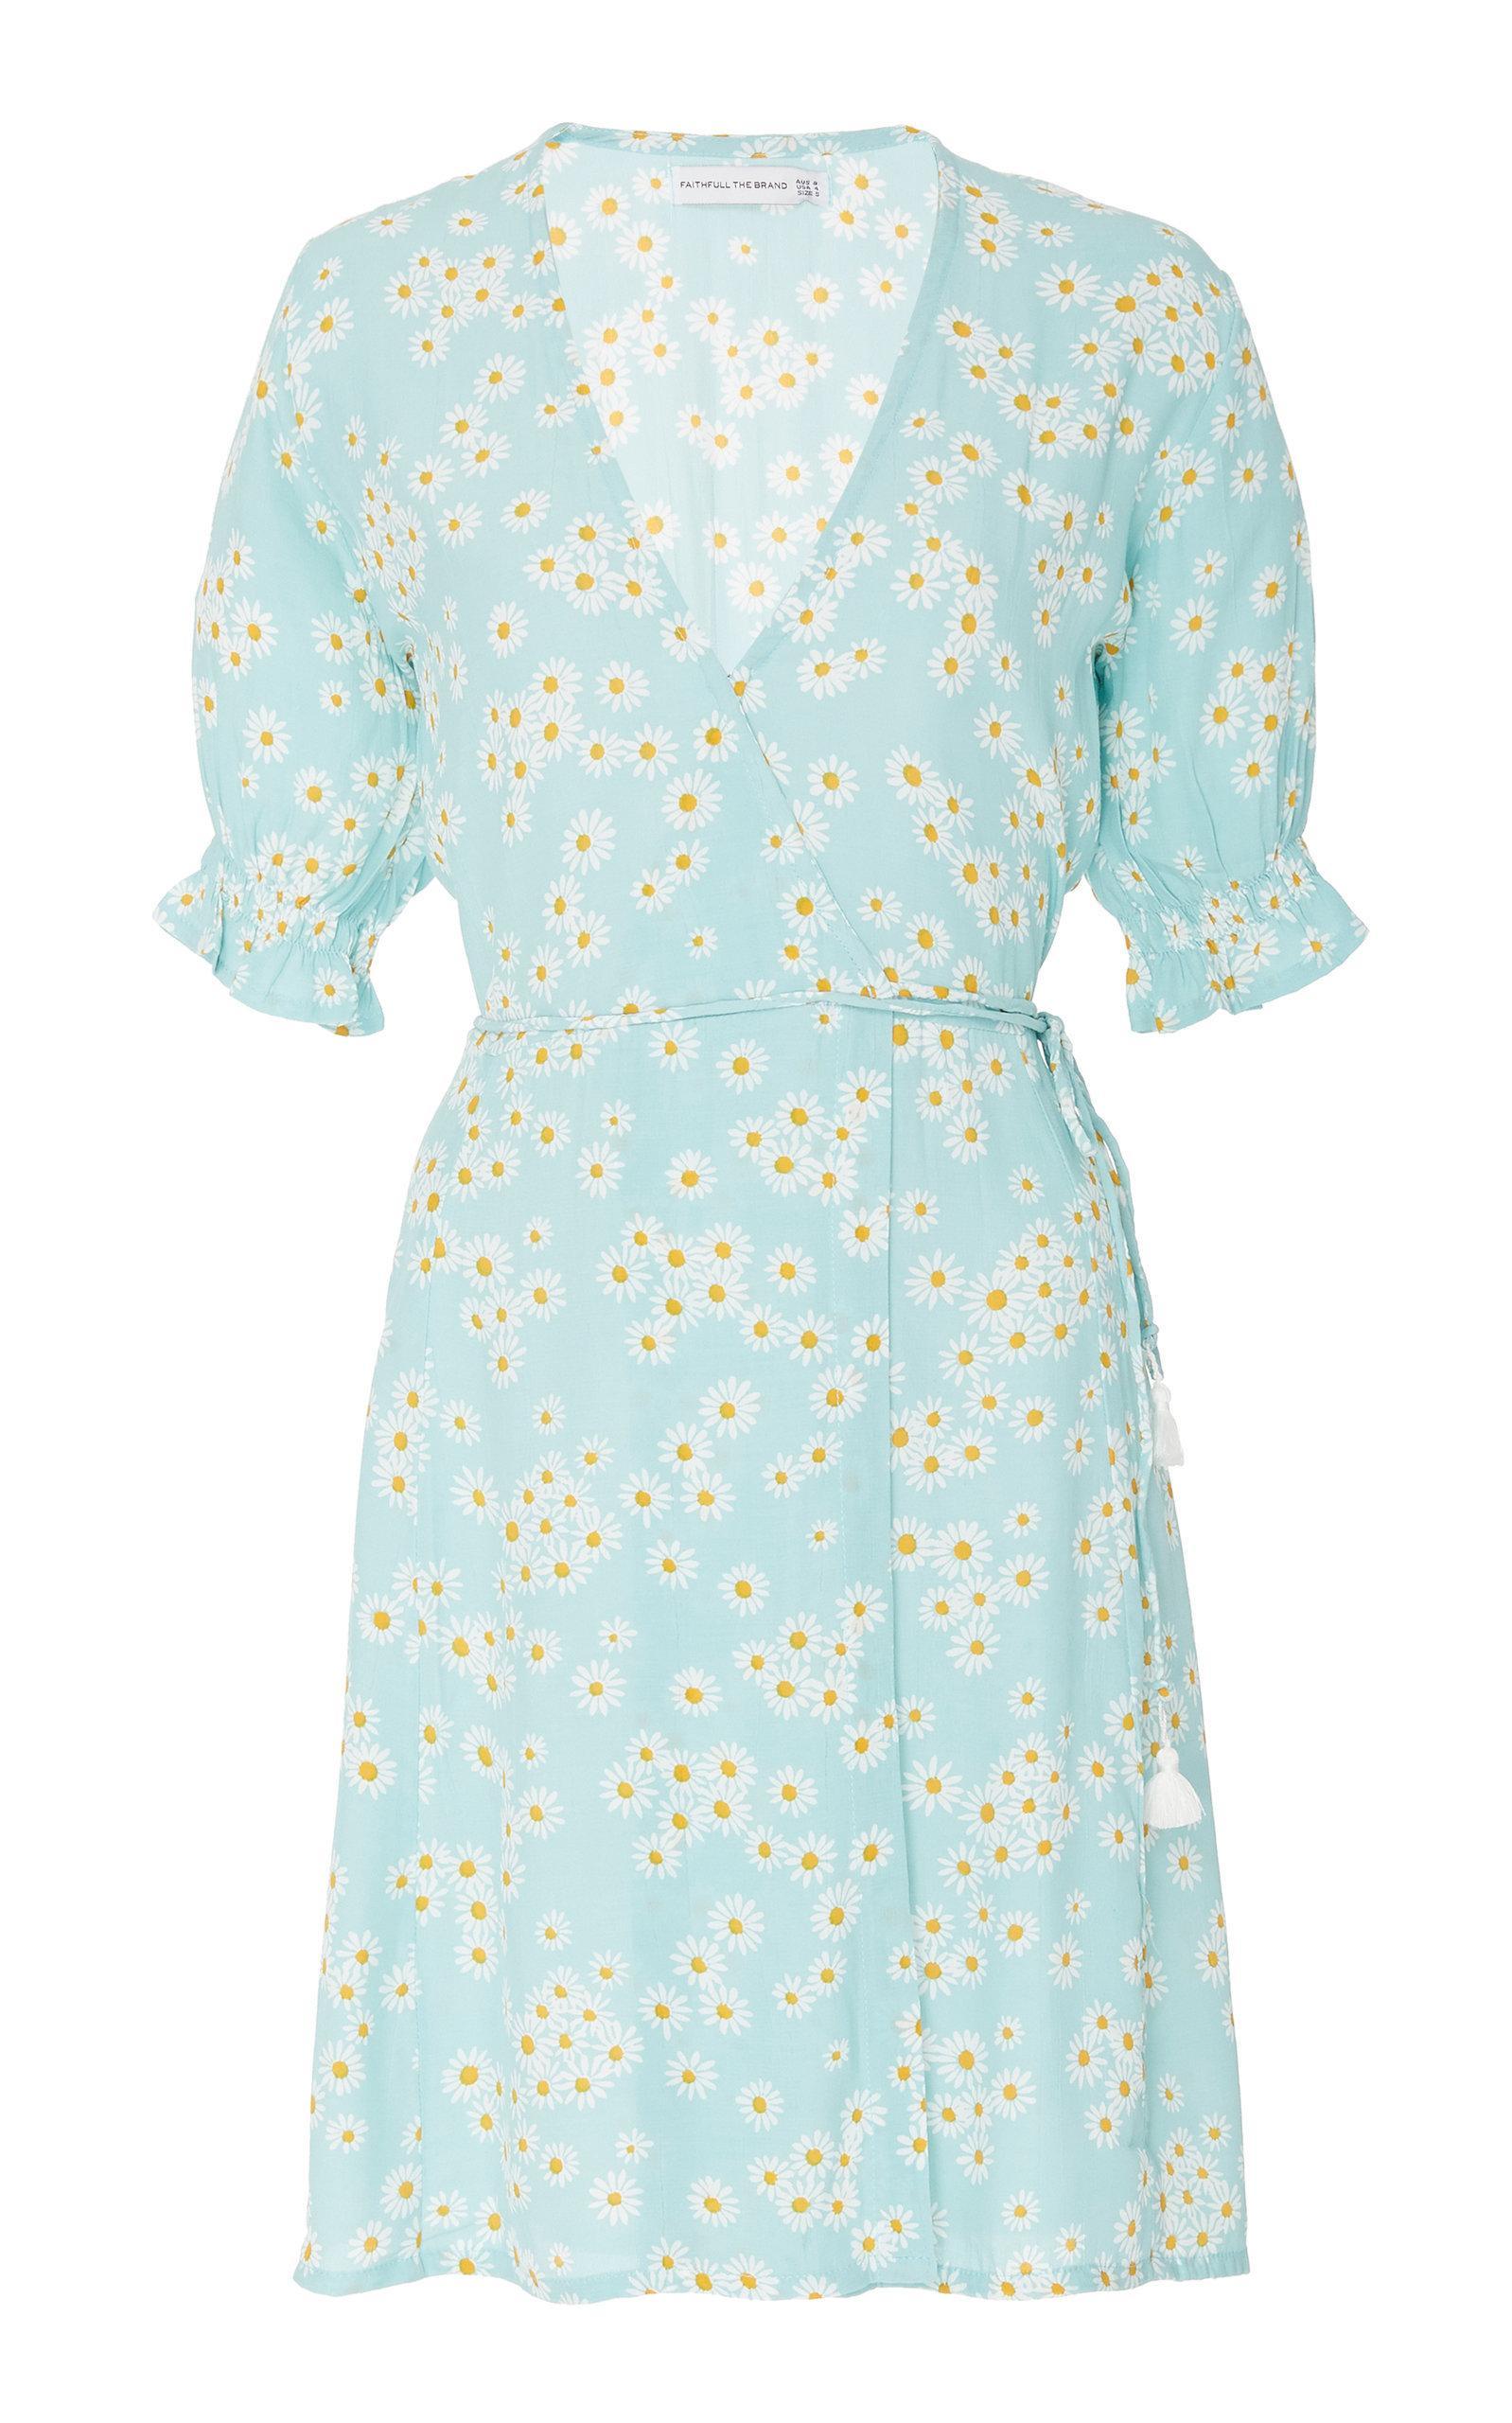 Faithfull Mira Floral Mini Dress In Blue